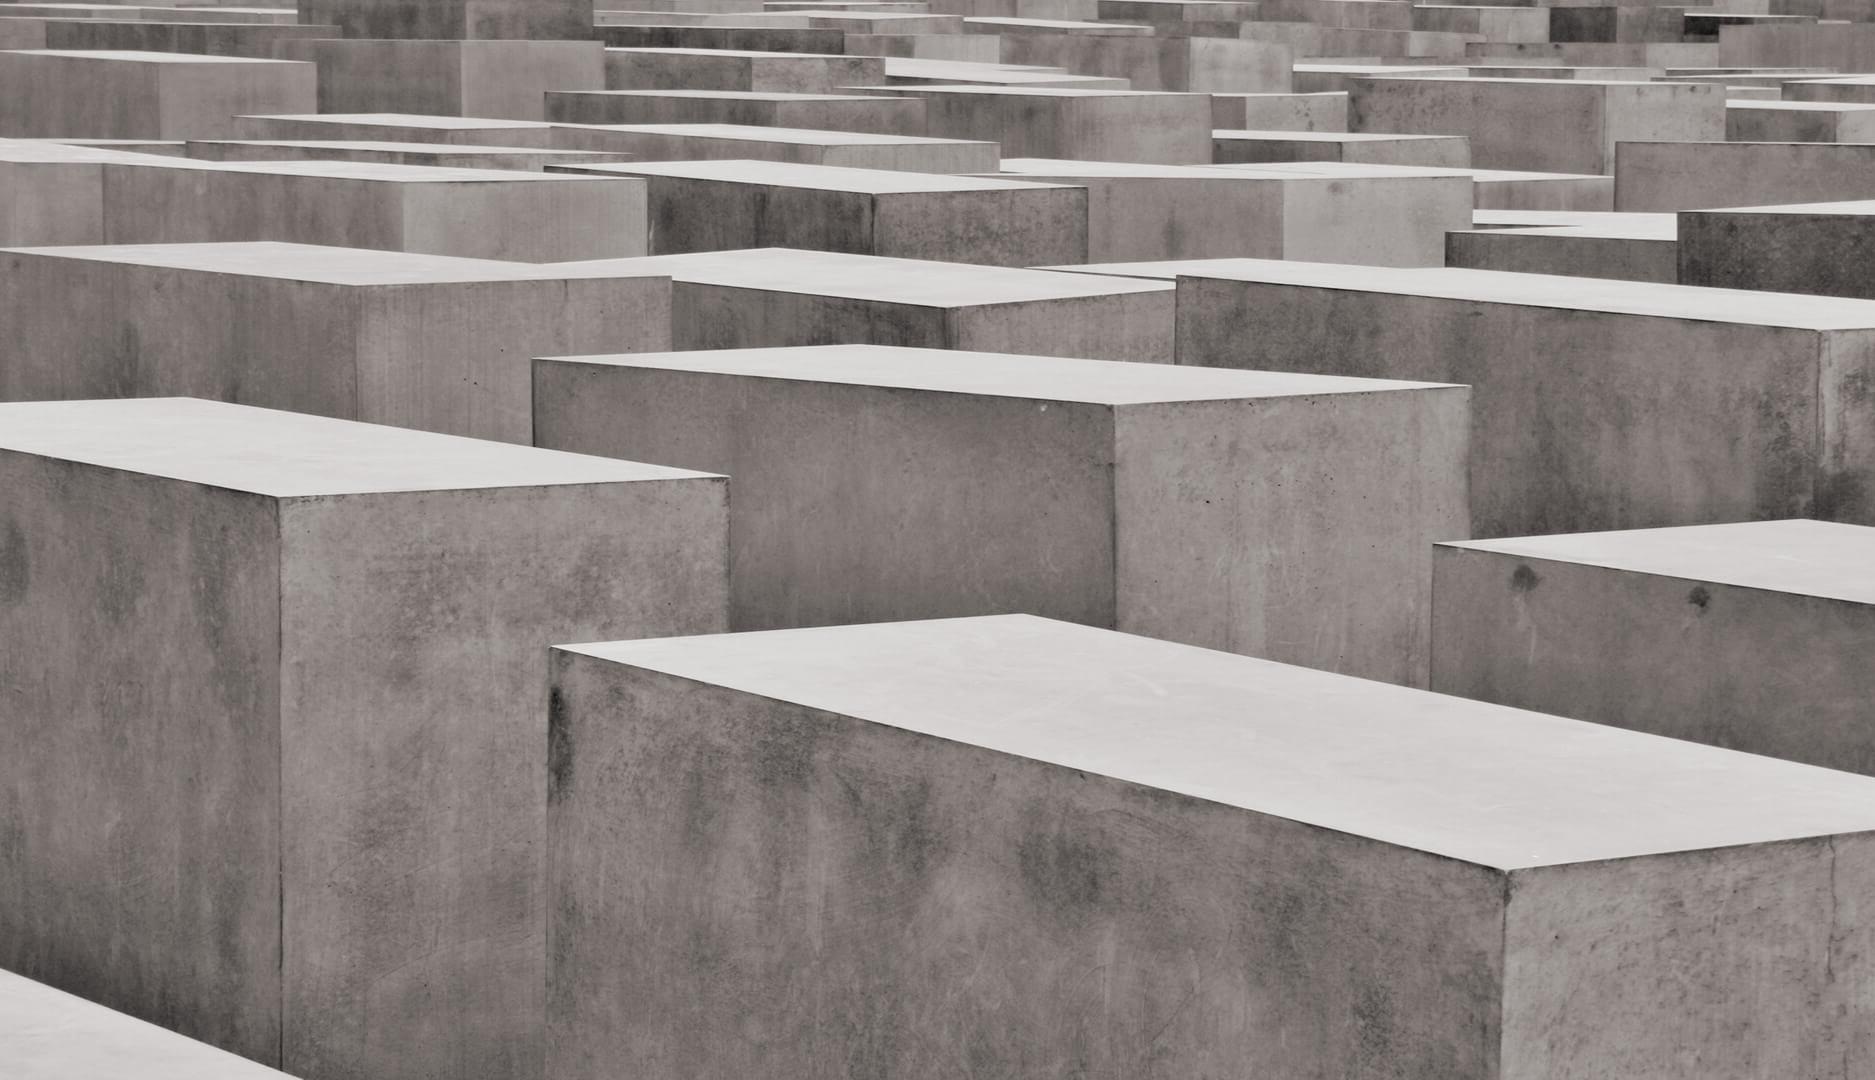 бетон тяжелый